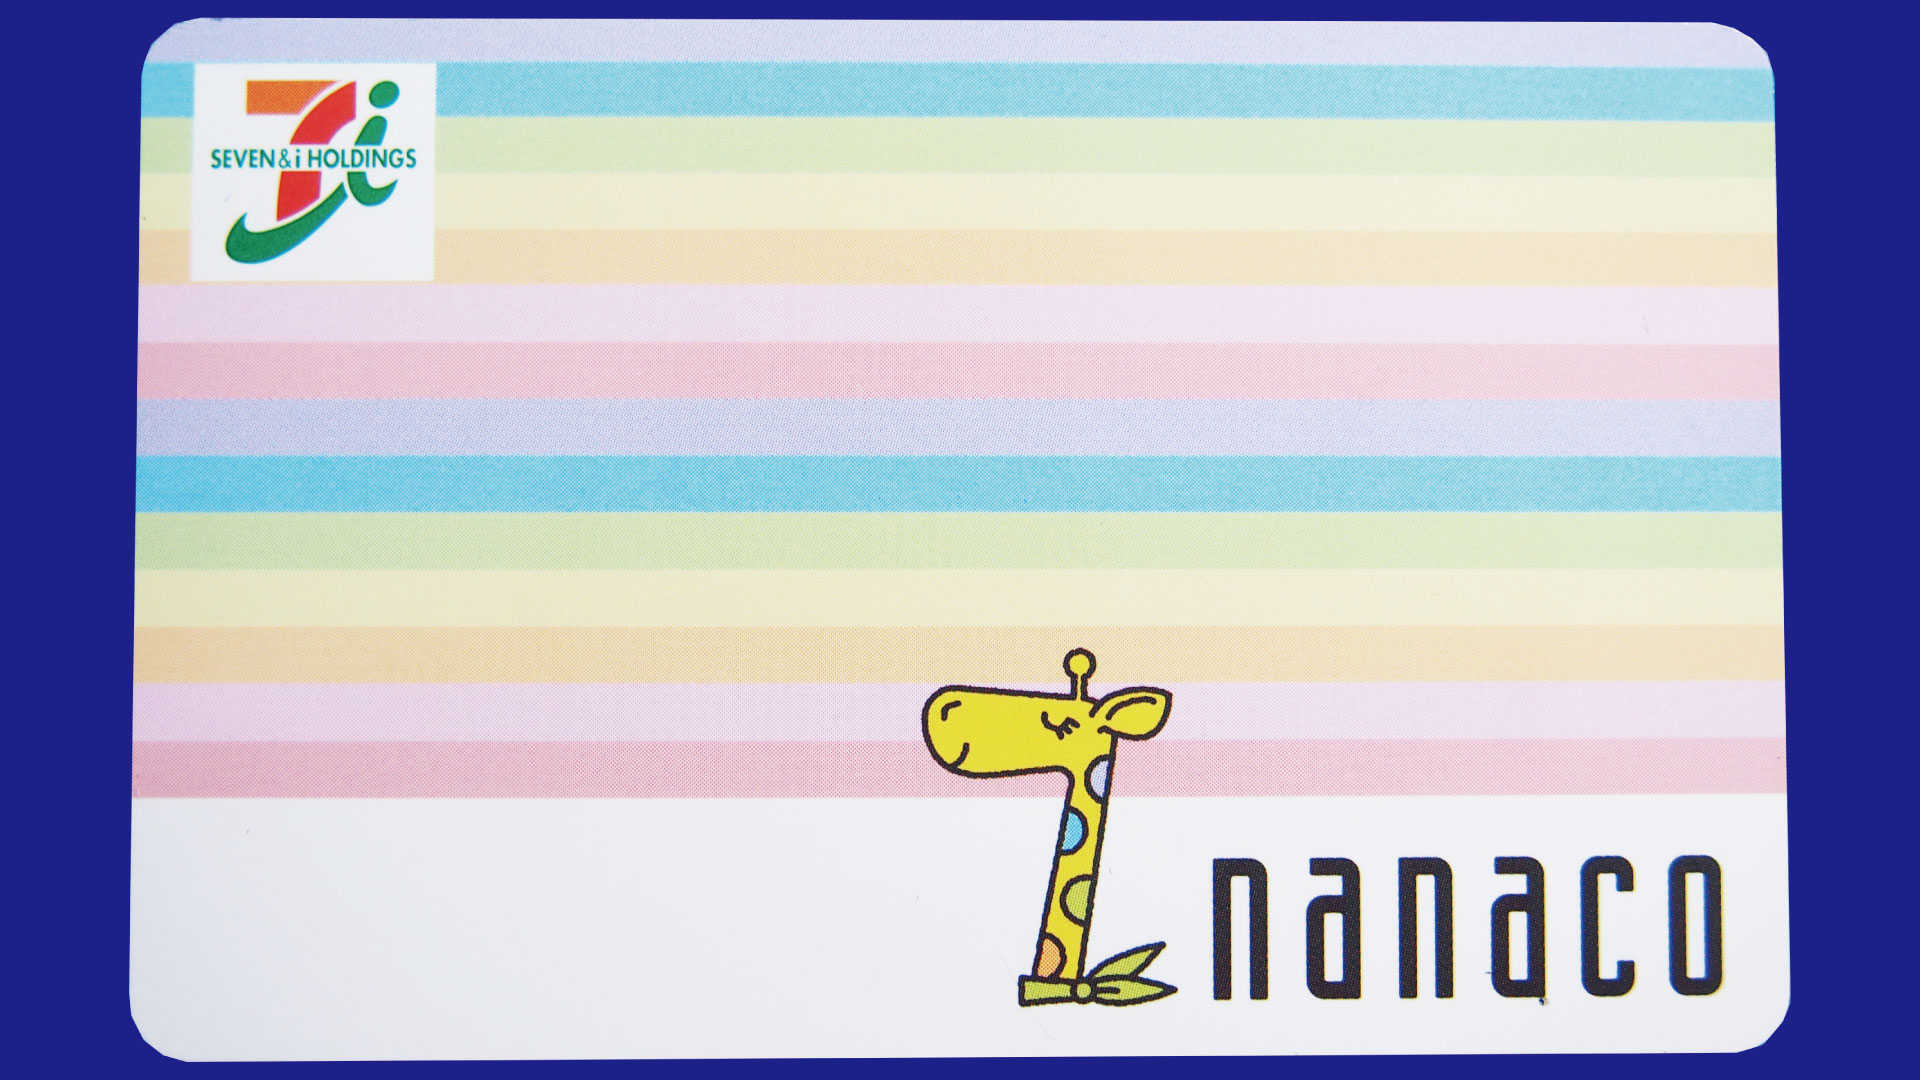 nanacocard